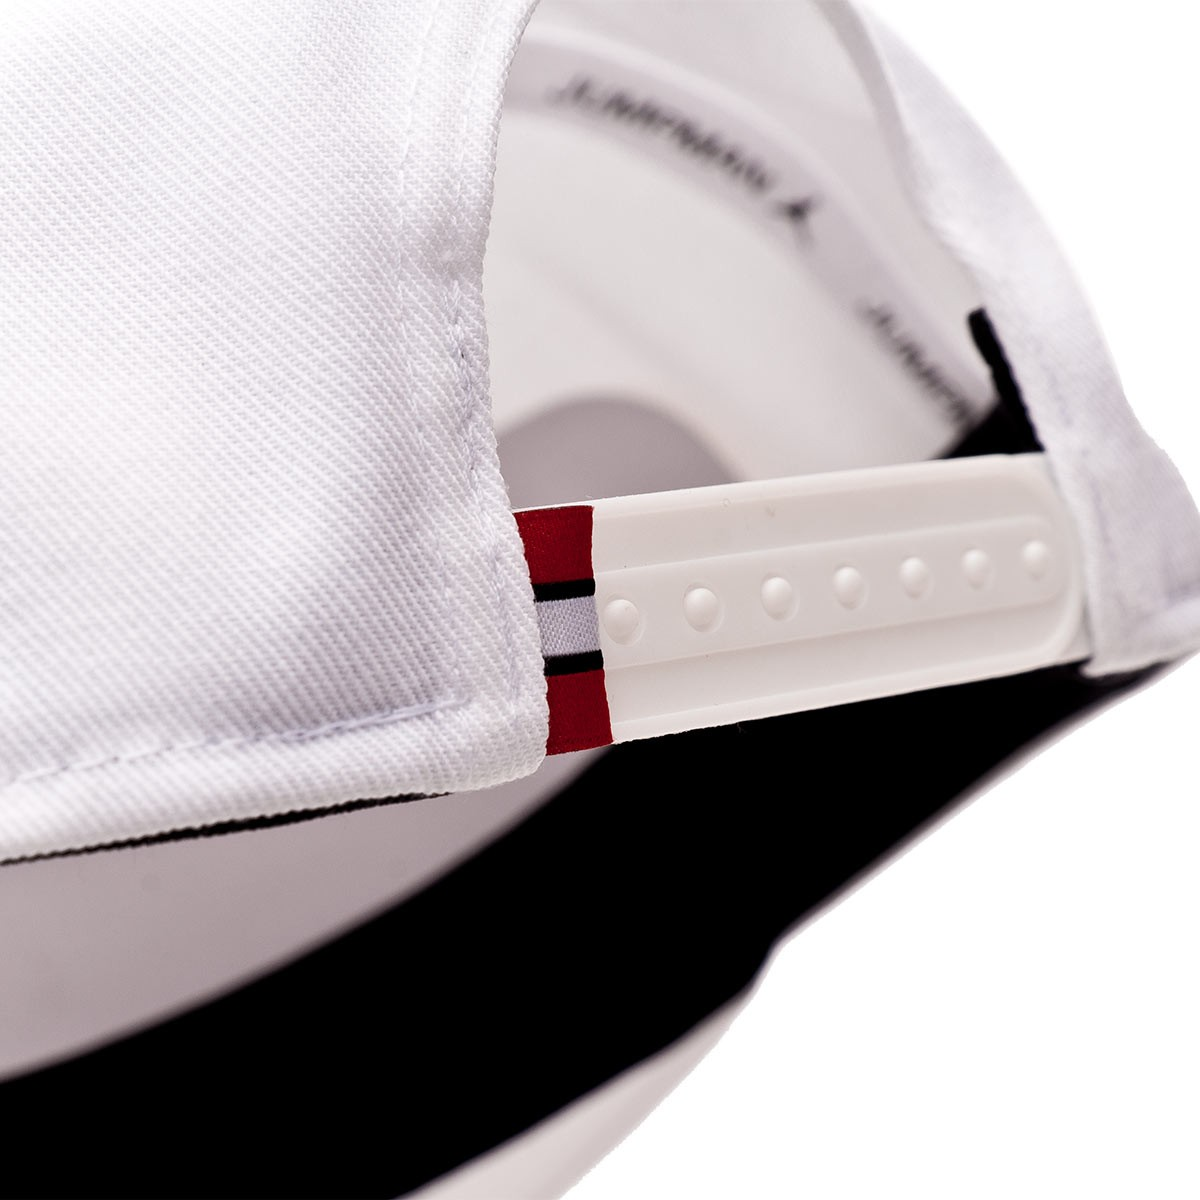 4d9a16b8 Cap Nike Jordan x PSG Pro White - Tienda de fútbol Fútbol Emotion